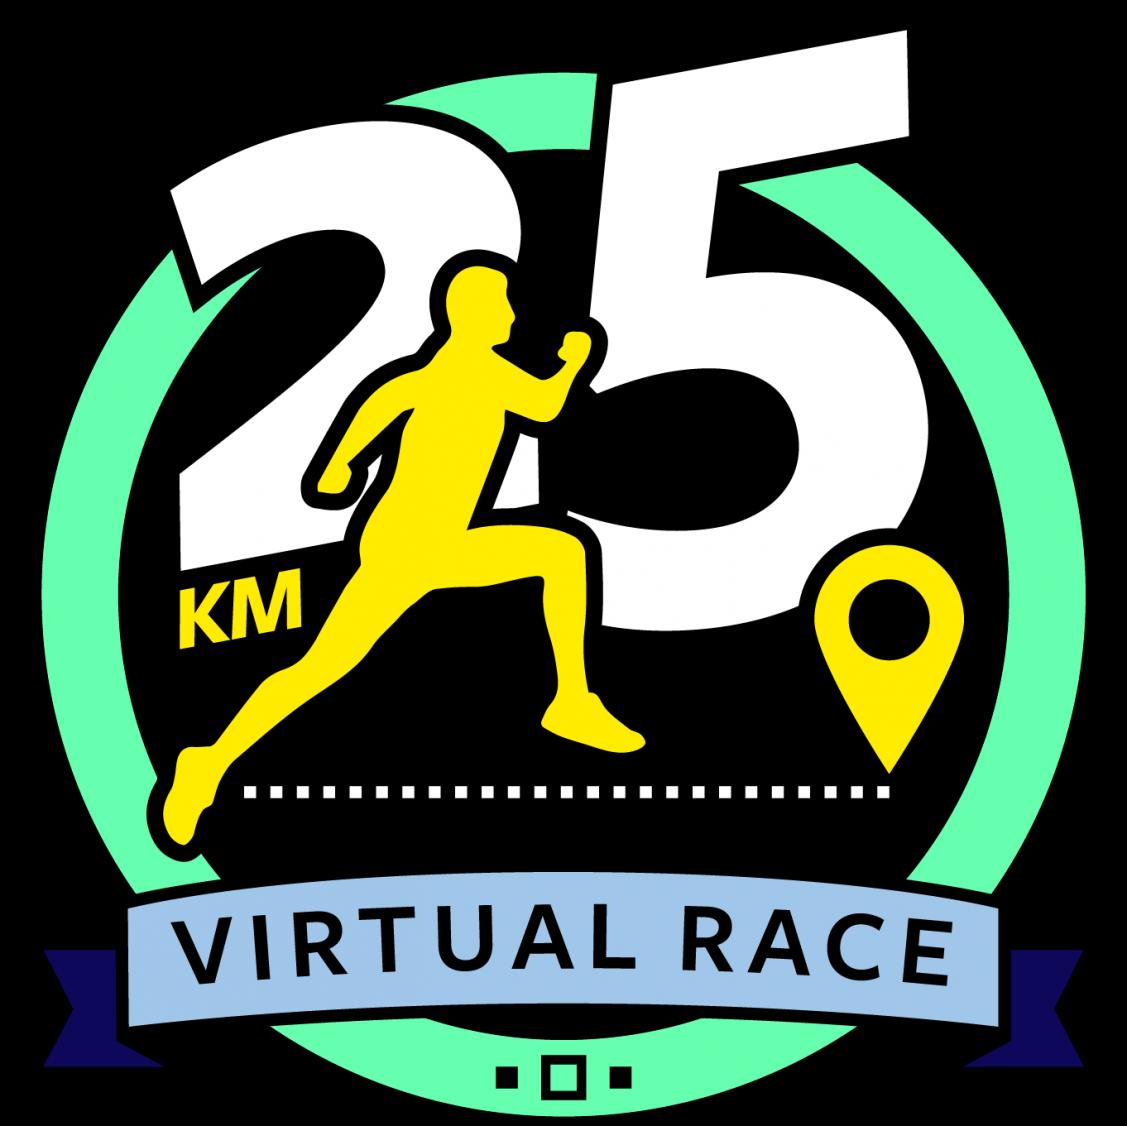 25 kilometer 2020